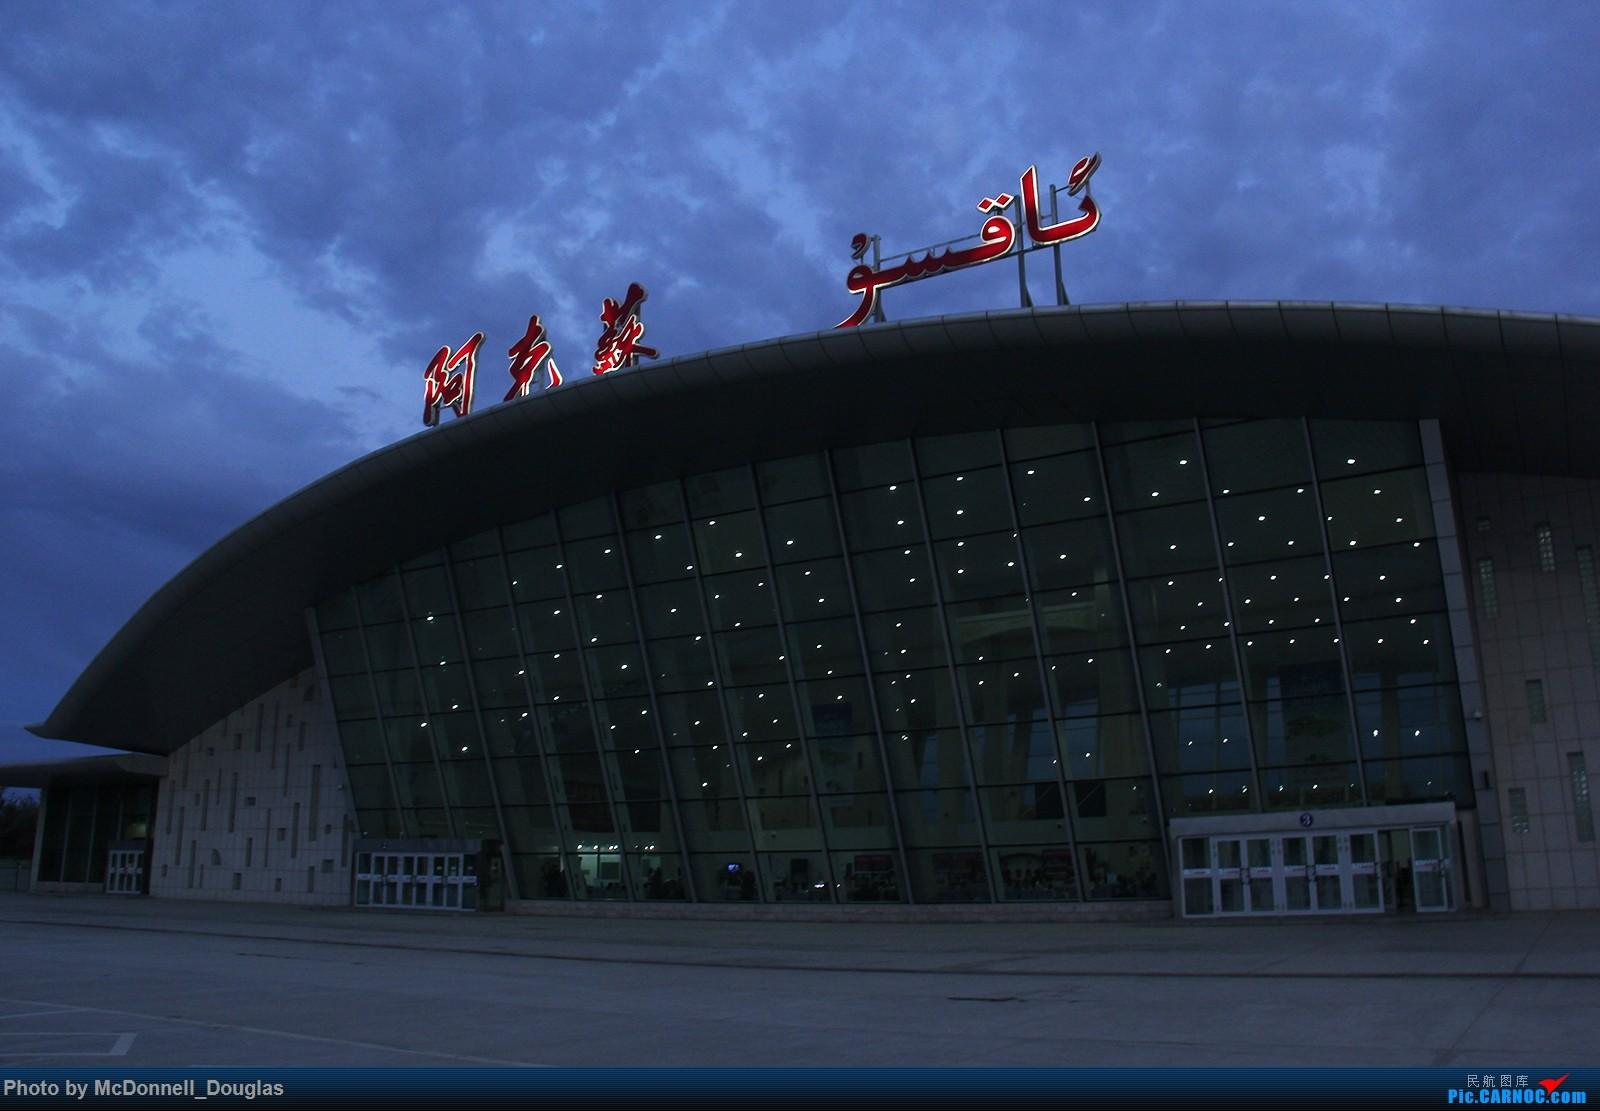 Re:[原创]【上海飞友会】【zc带你走天下(2)】再访祖辈年轻时工作的土地,父母年少时生活戈壁,跨越大半个中国去看新疆,回程小游蓉城(上) EMBRAER ERJ-190LR B-3120 中国阿克苏机场 中国阿克苏机场